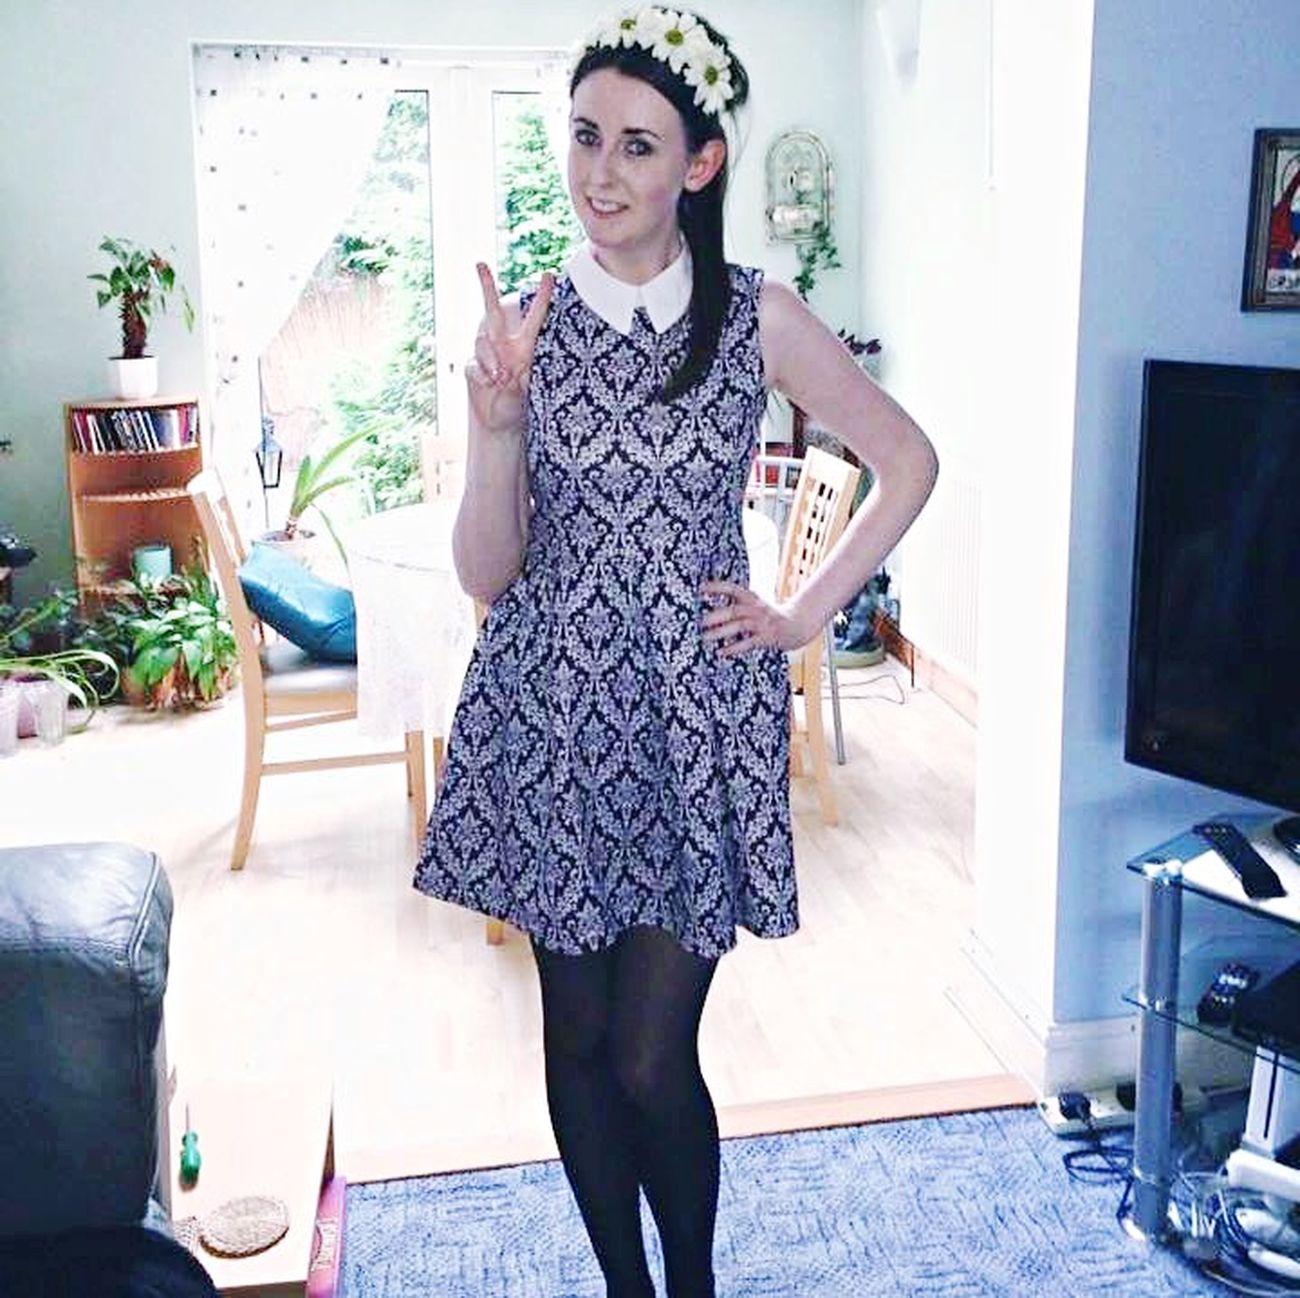 Fashion Dress Retro Vintage Sixties Patterns Style My Unique Style Flower Power Peace ✌